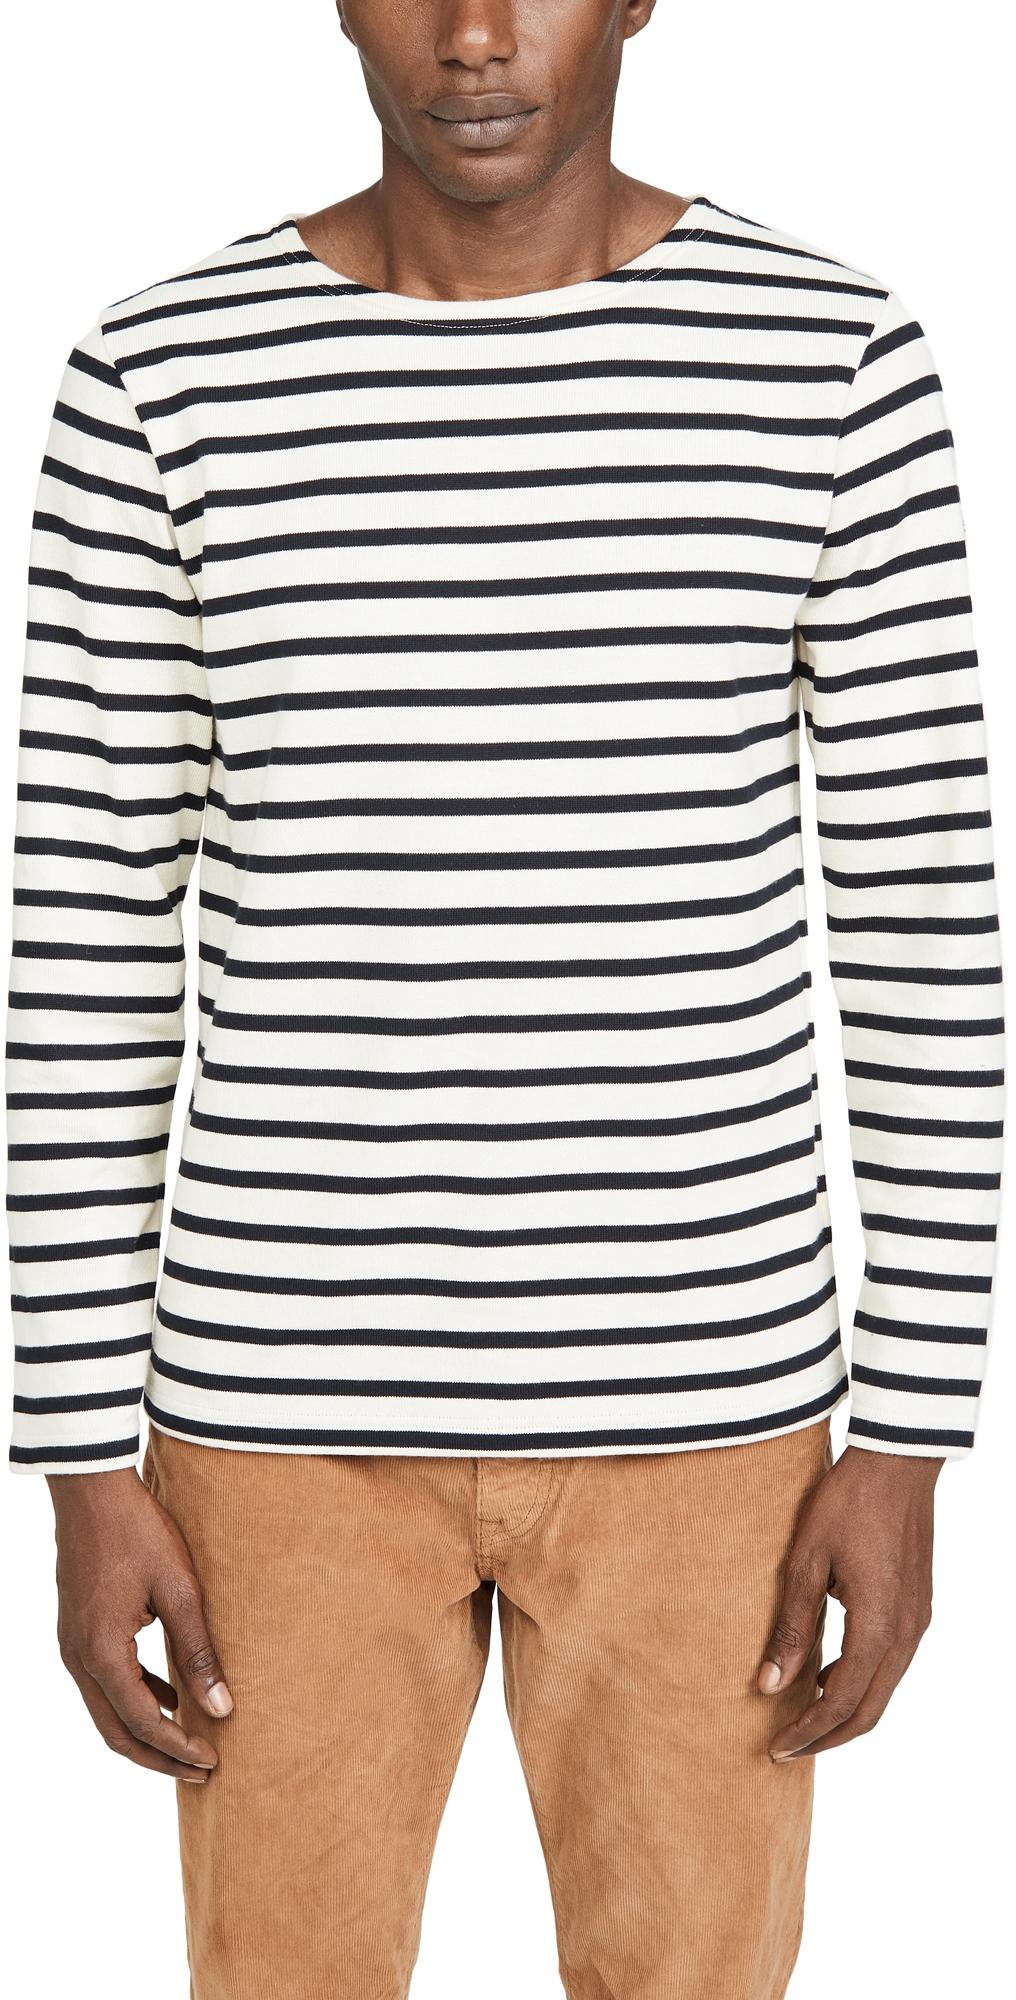 Striped Marinière Aviron T-Shirt